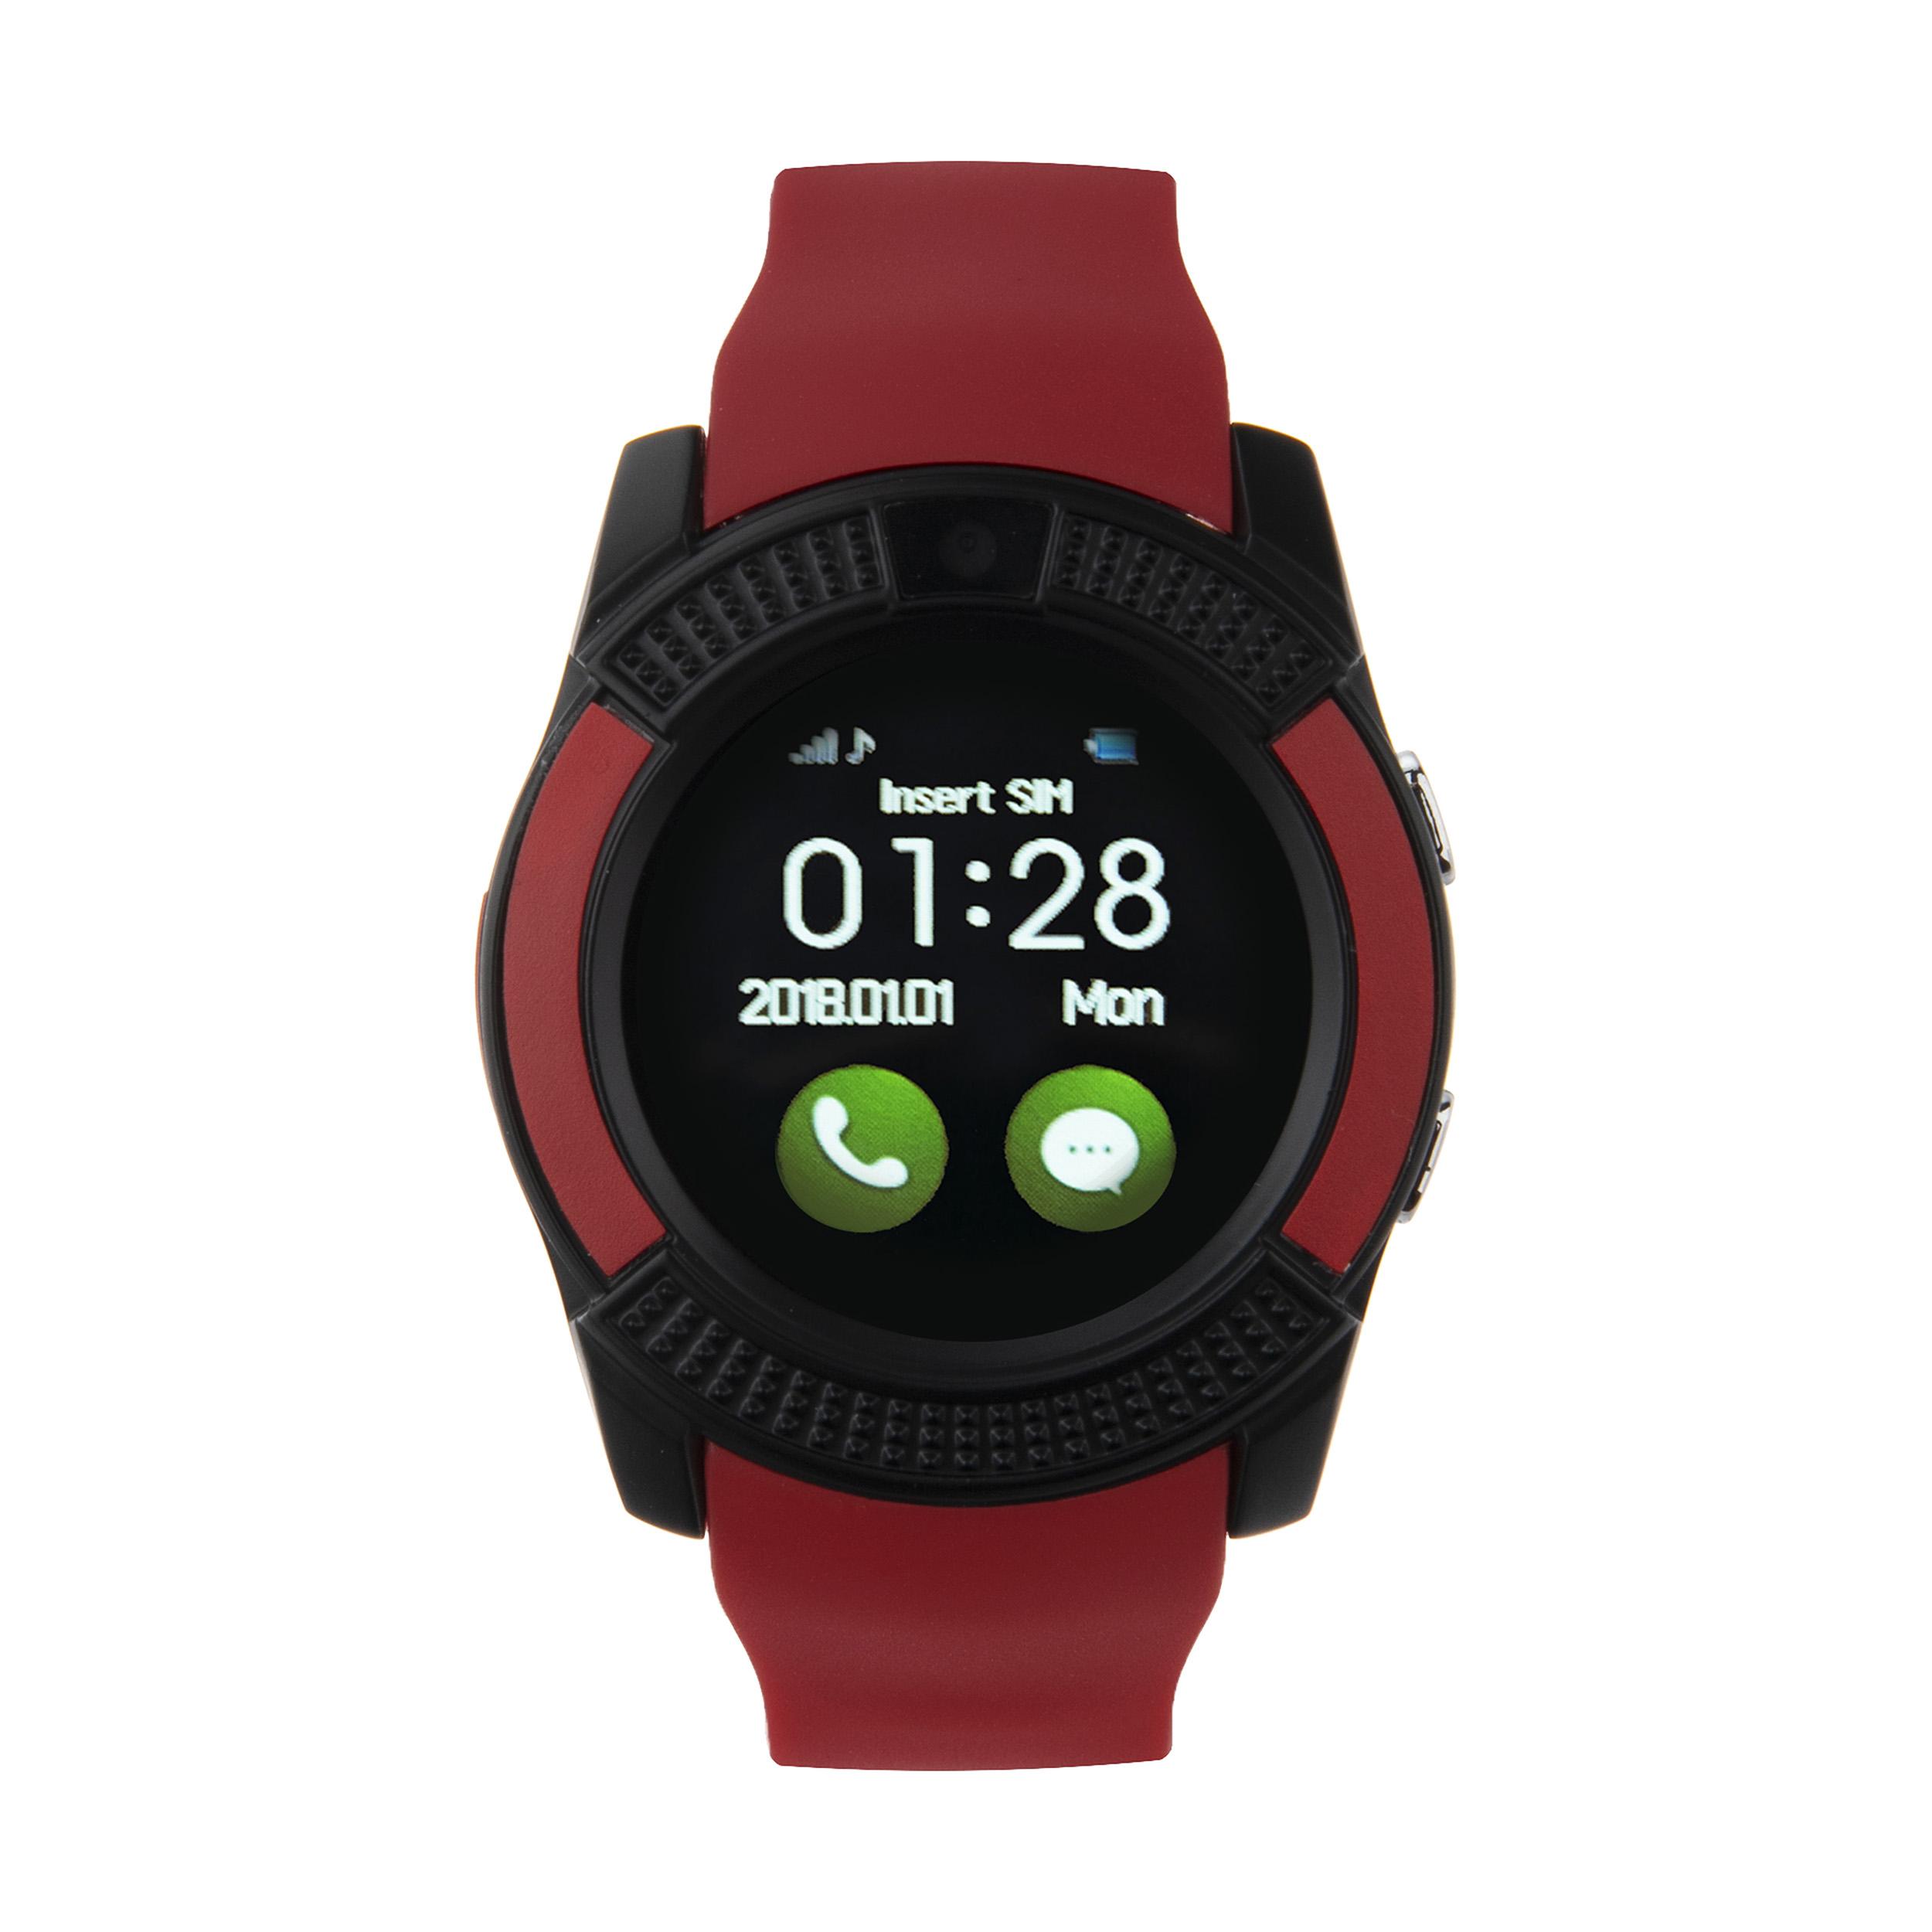 ساعت هوشمند وی سریز مدل WE V8 الف 001